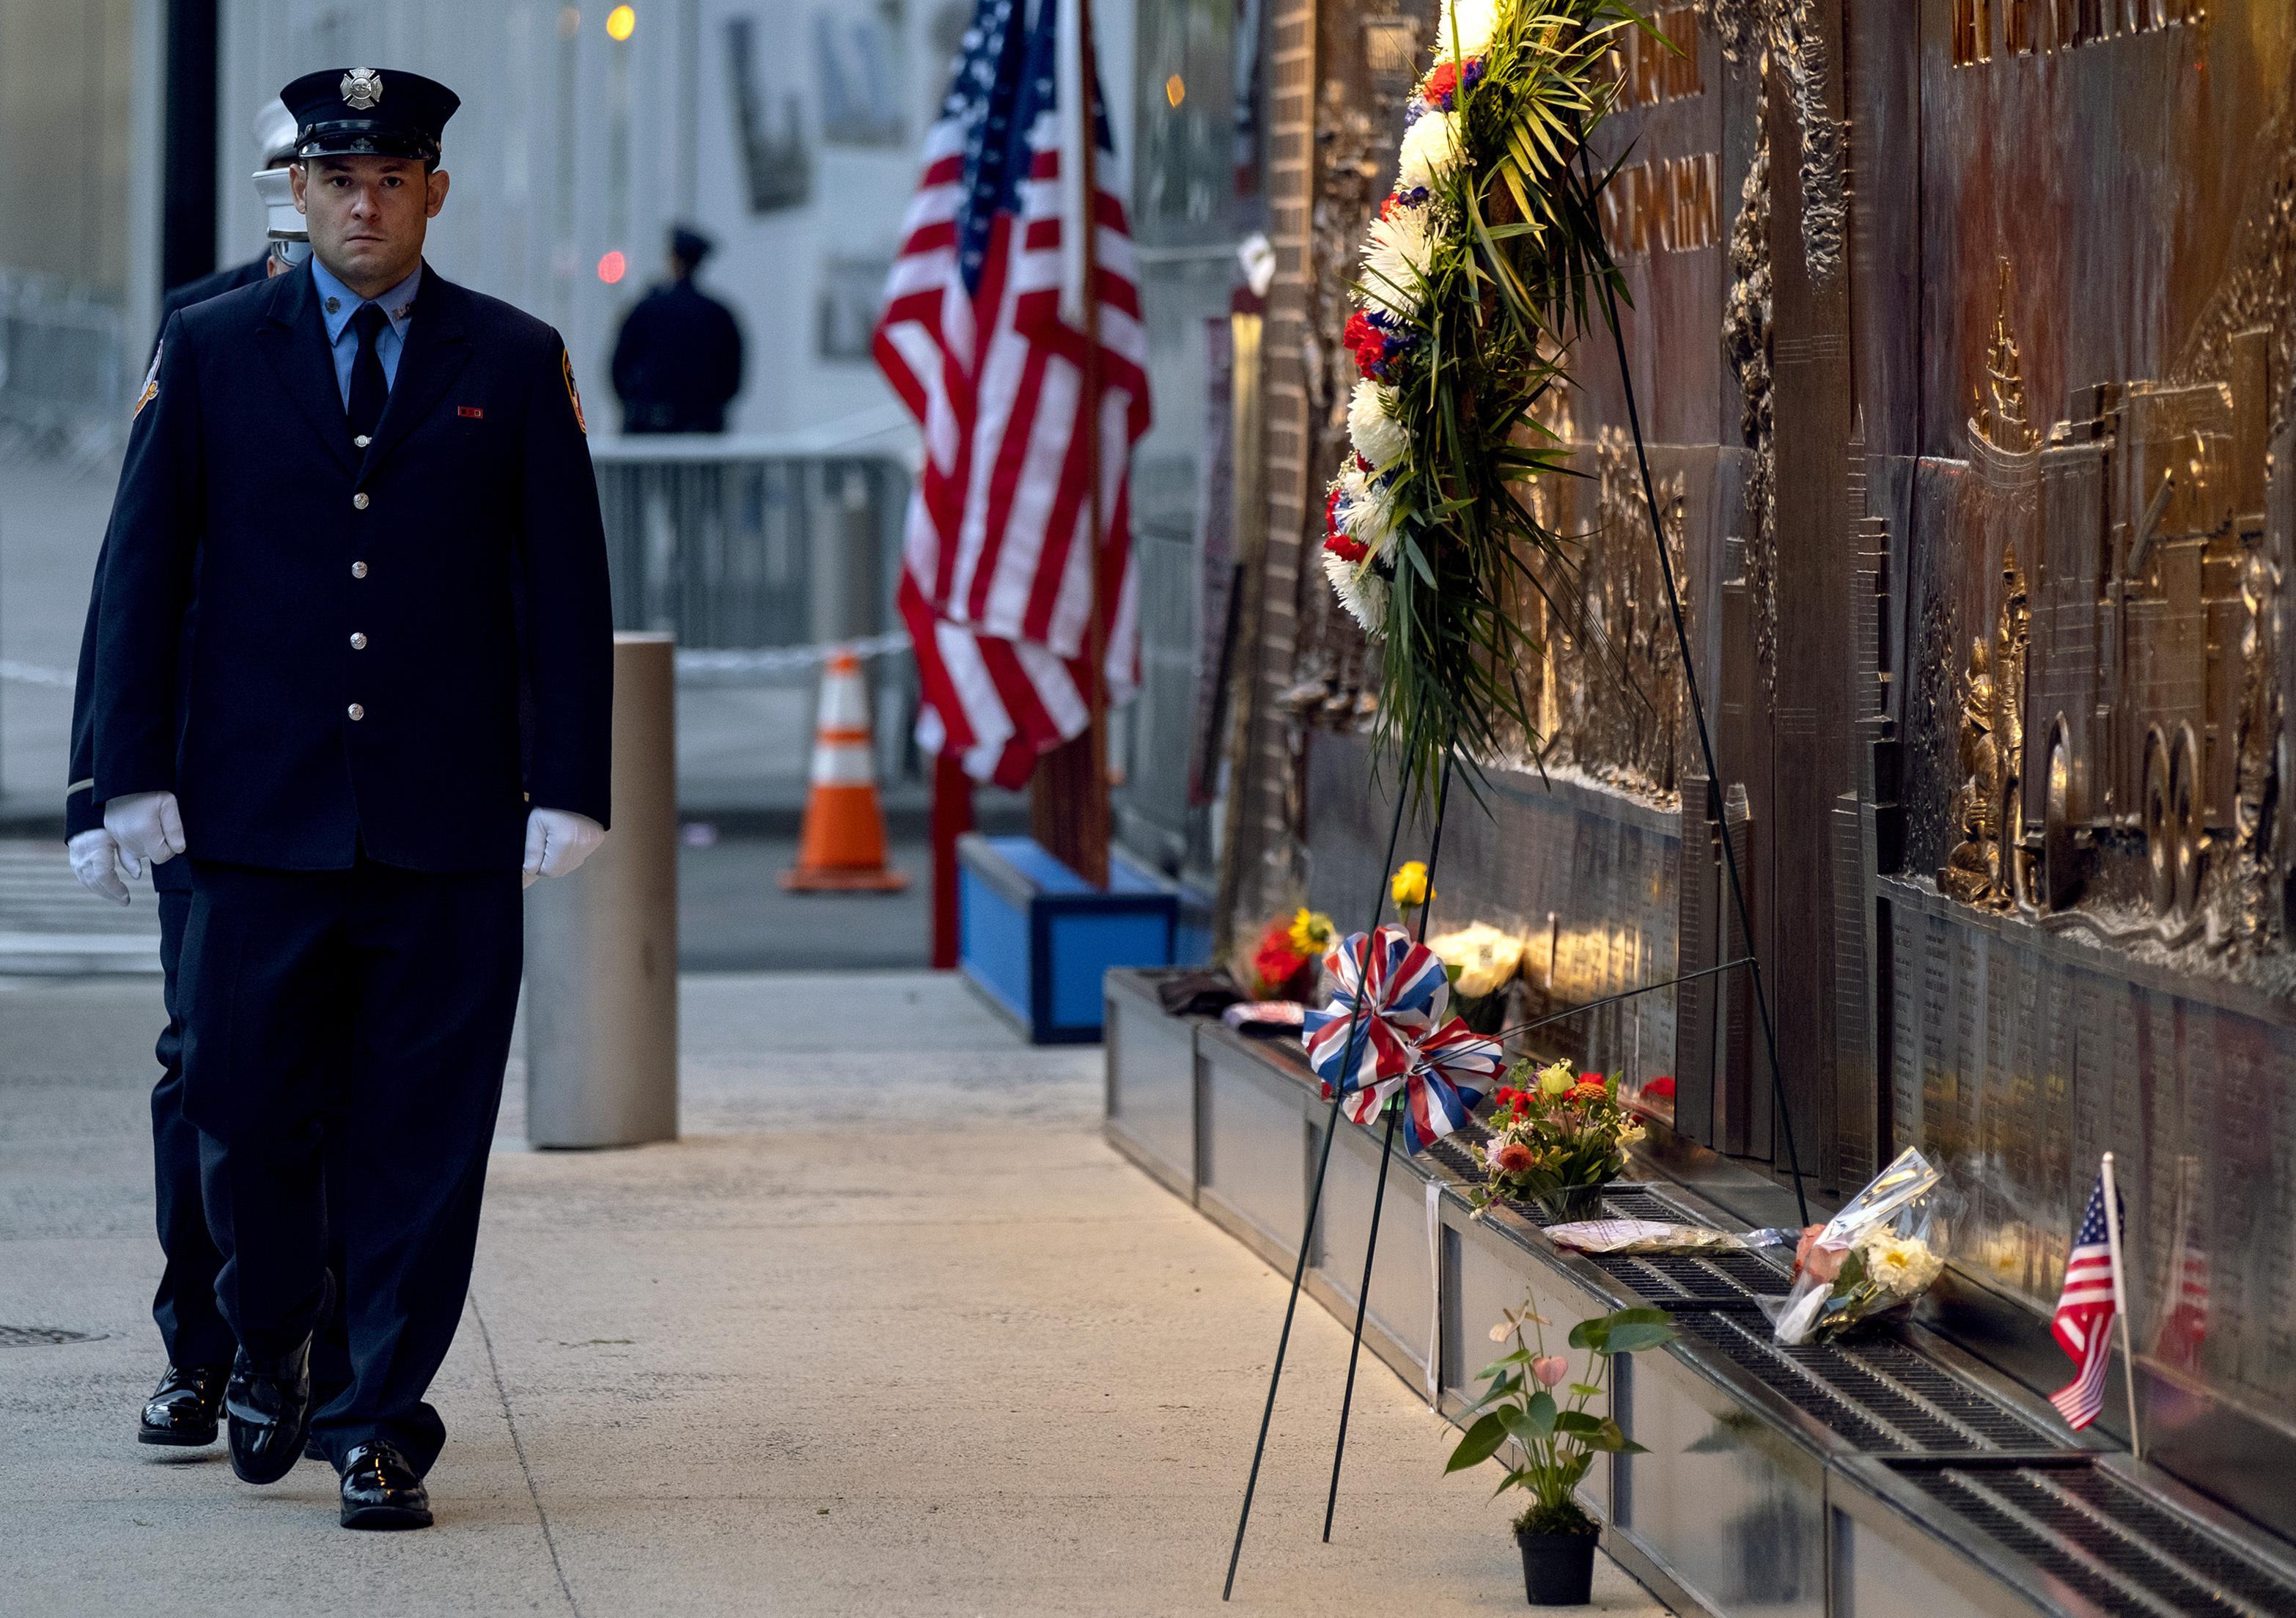 Al Qaeda's chilling 9/11 reminder: Keep killing Americans